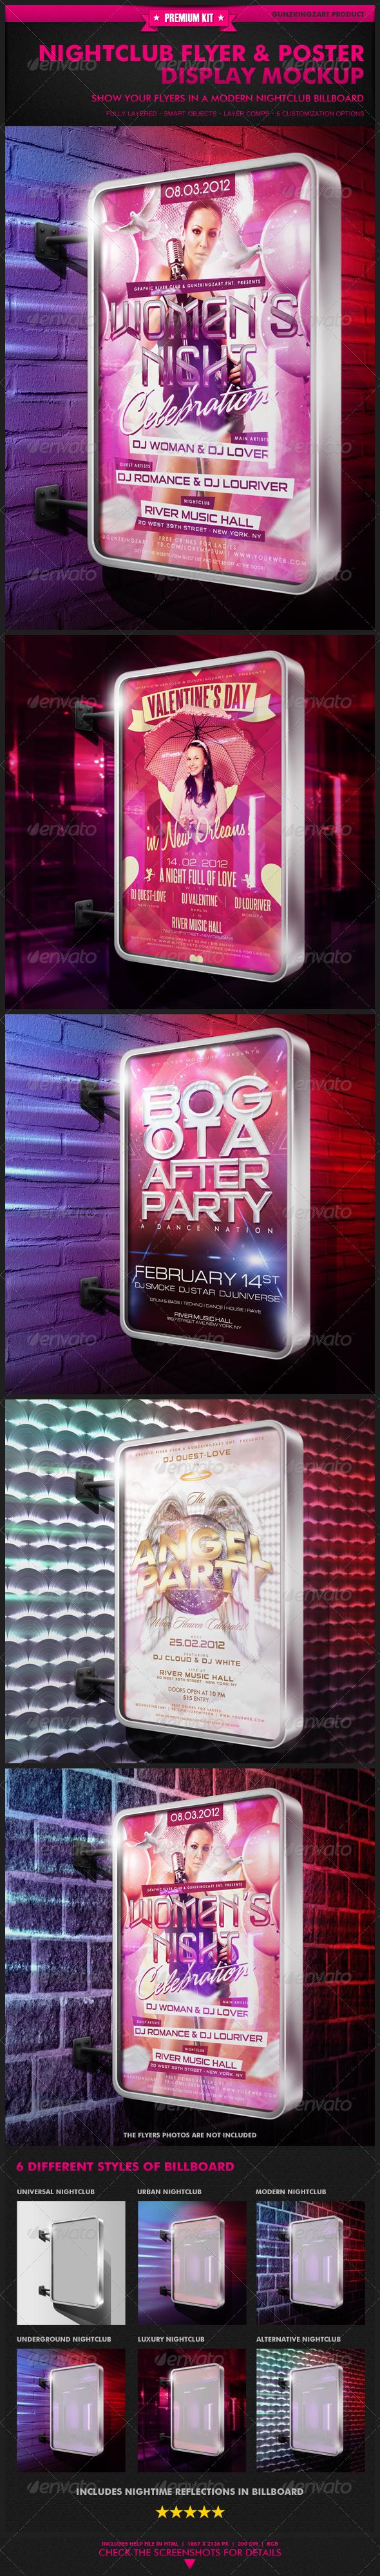 Nightclub Flyer & Poster Display Mockup - Flyers Print